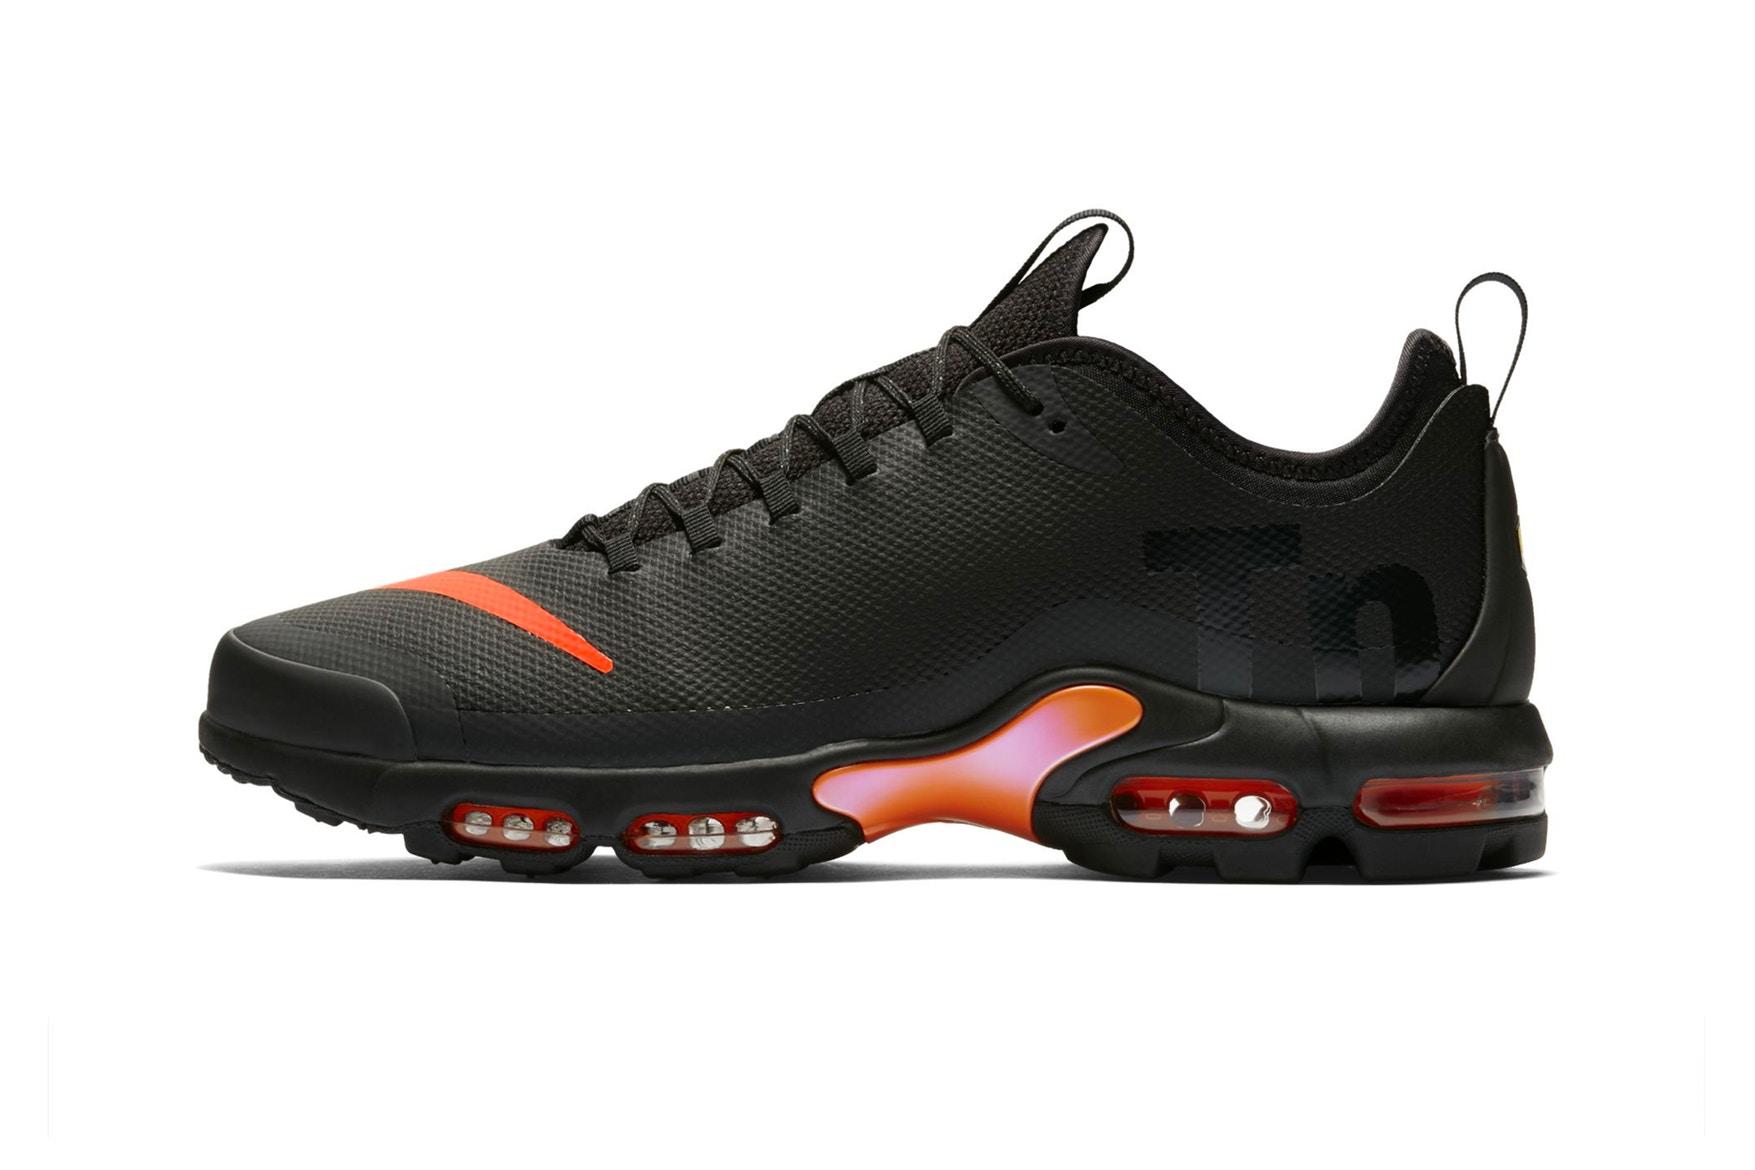 nike-air-max-plus-tn-se-black-orange-001